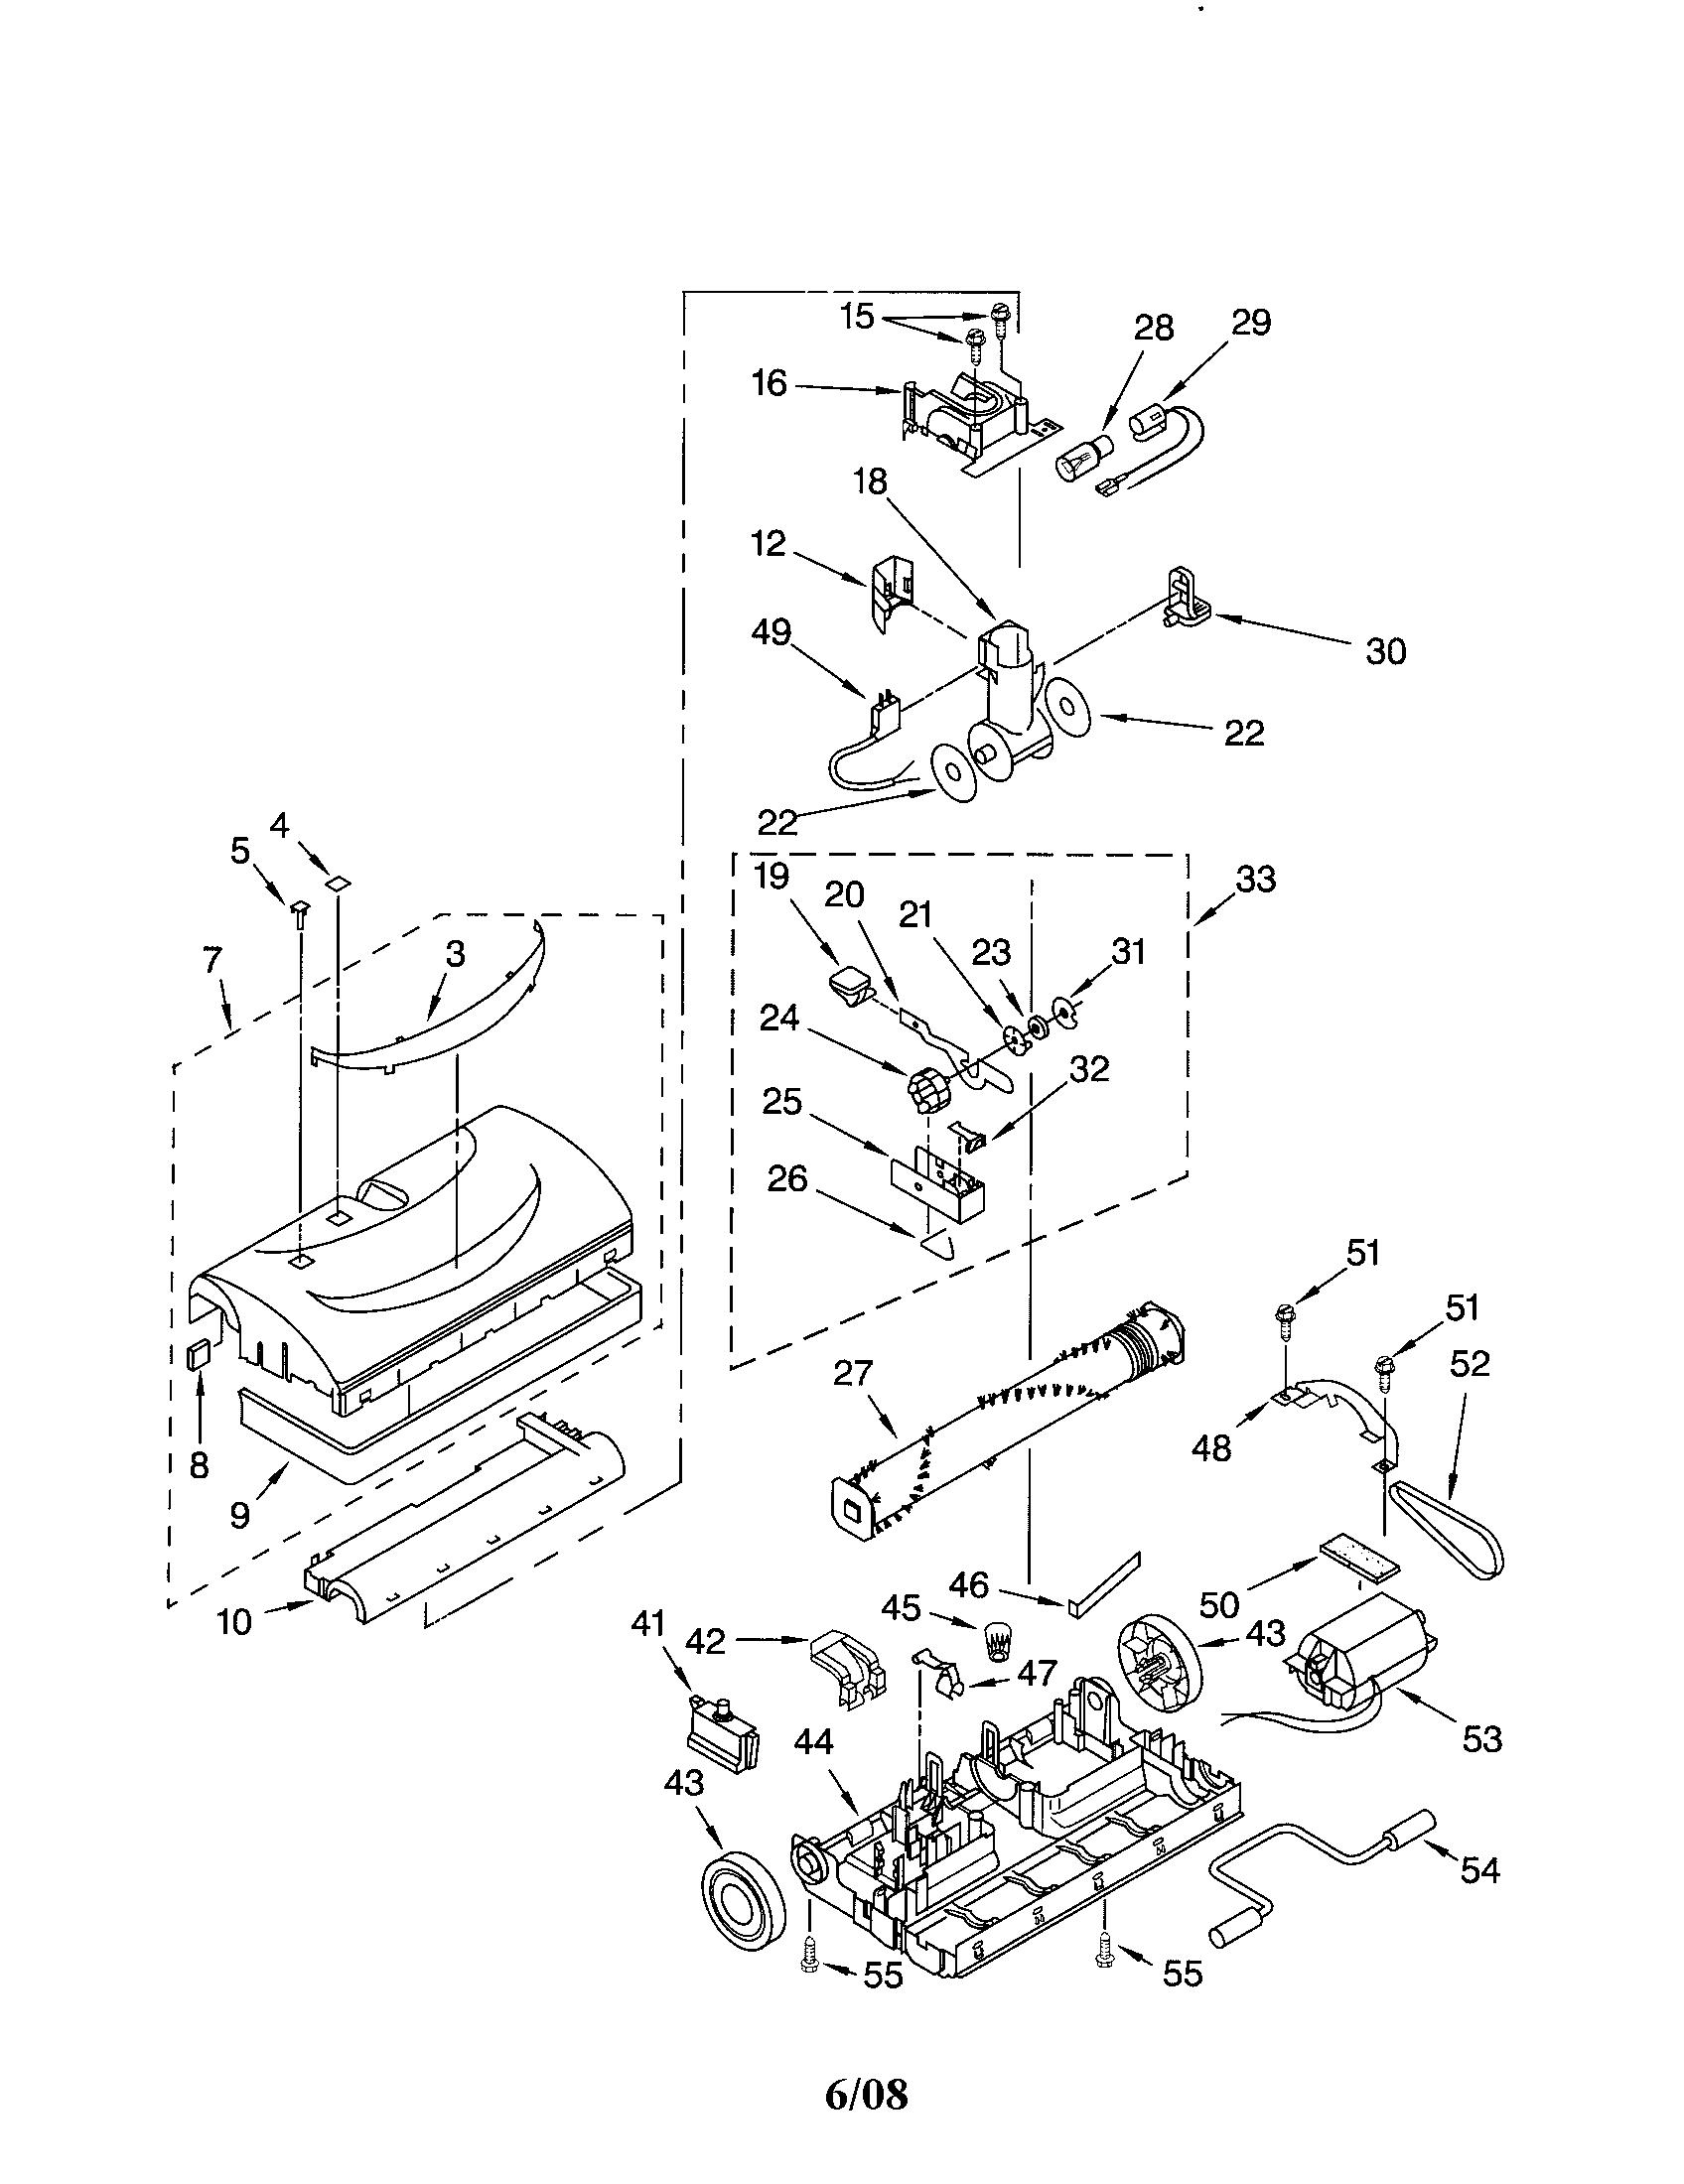 Wiring Diagram: 28 Kenmore Vacuum Parts Diagram